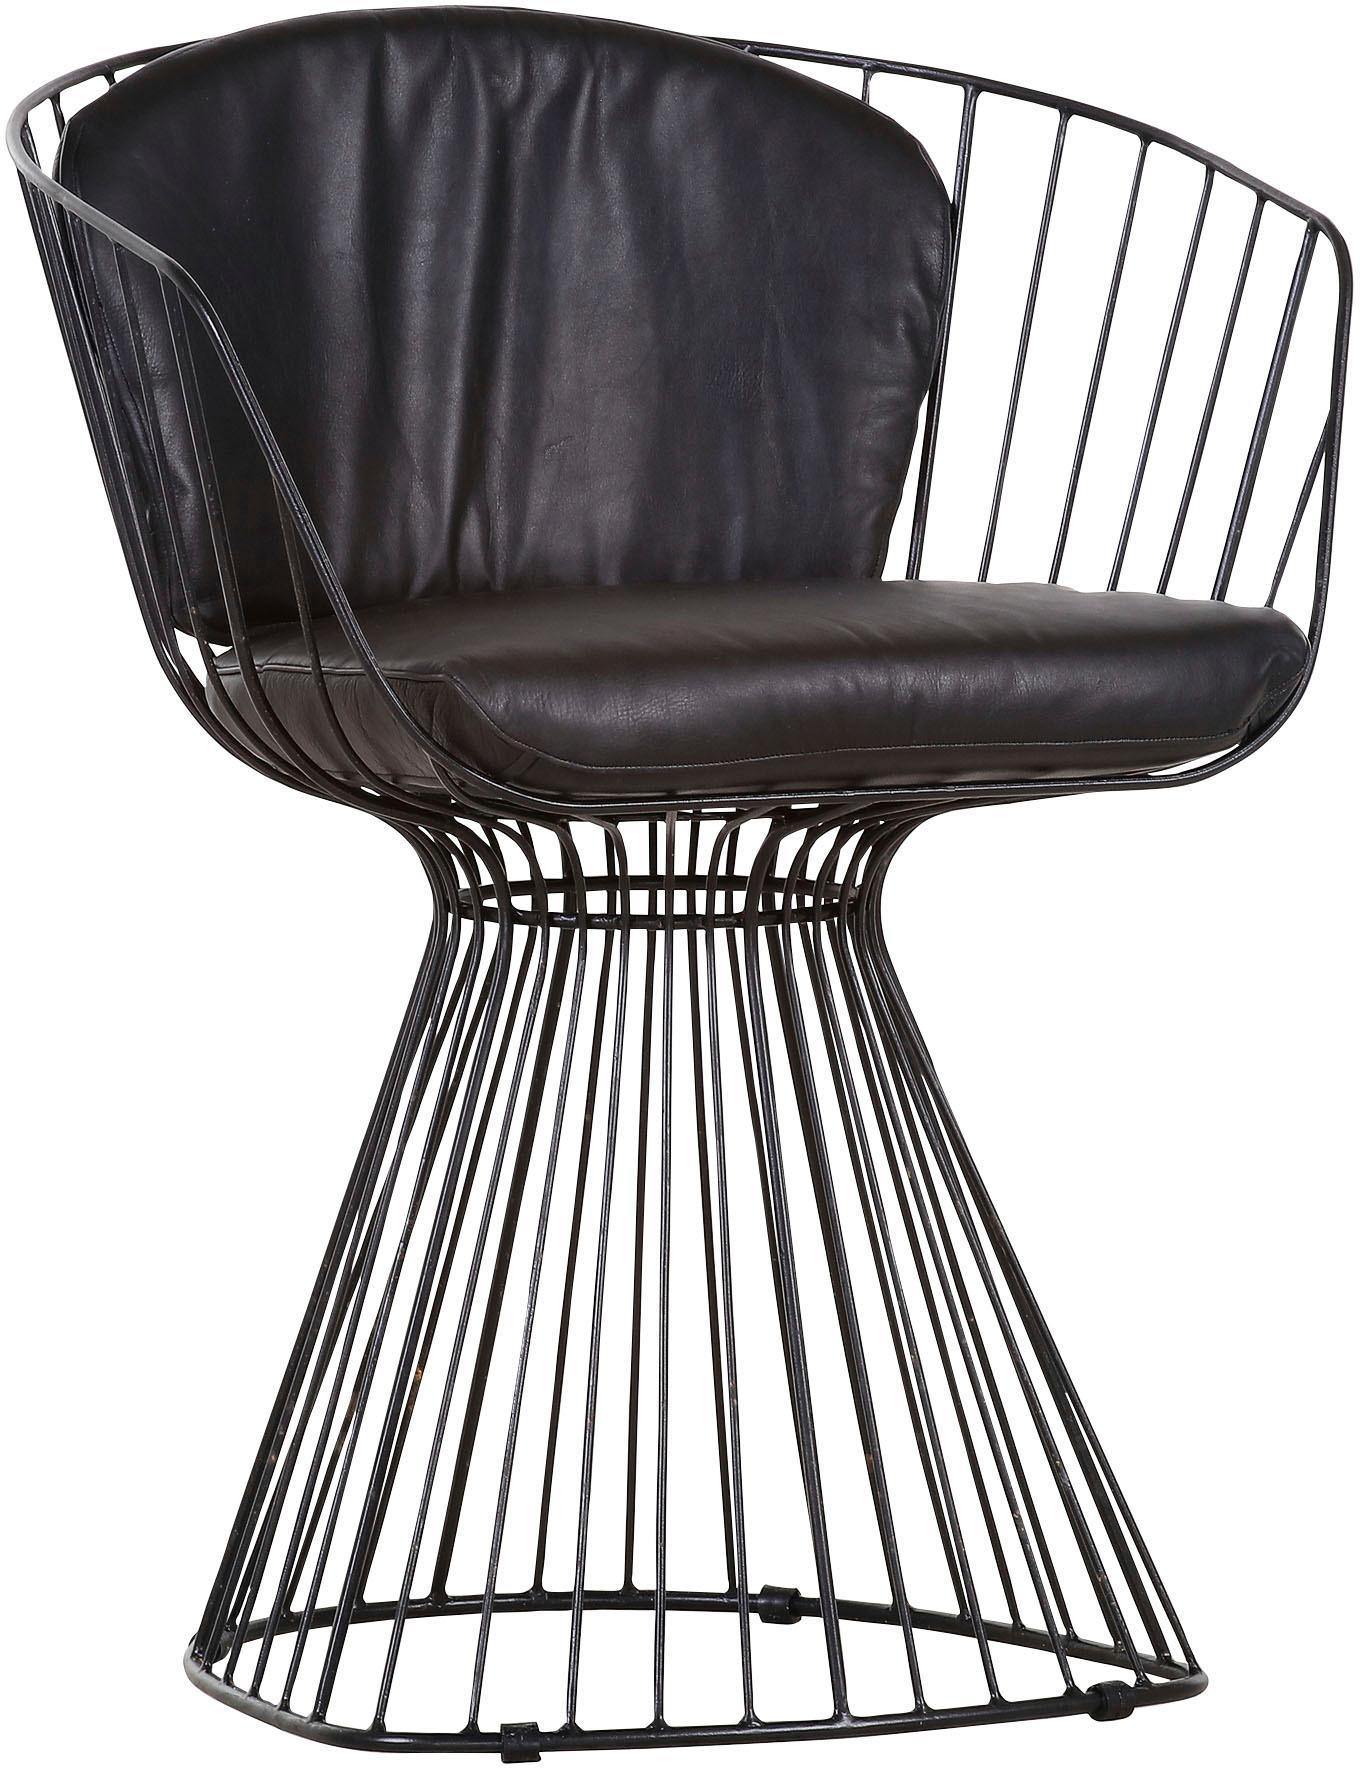 Gutmann Factory Sessel Maestro inklusive Polsterkissen